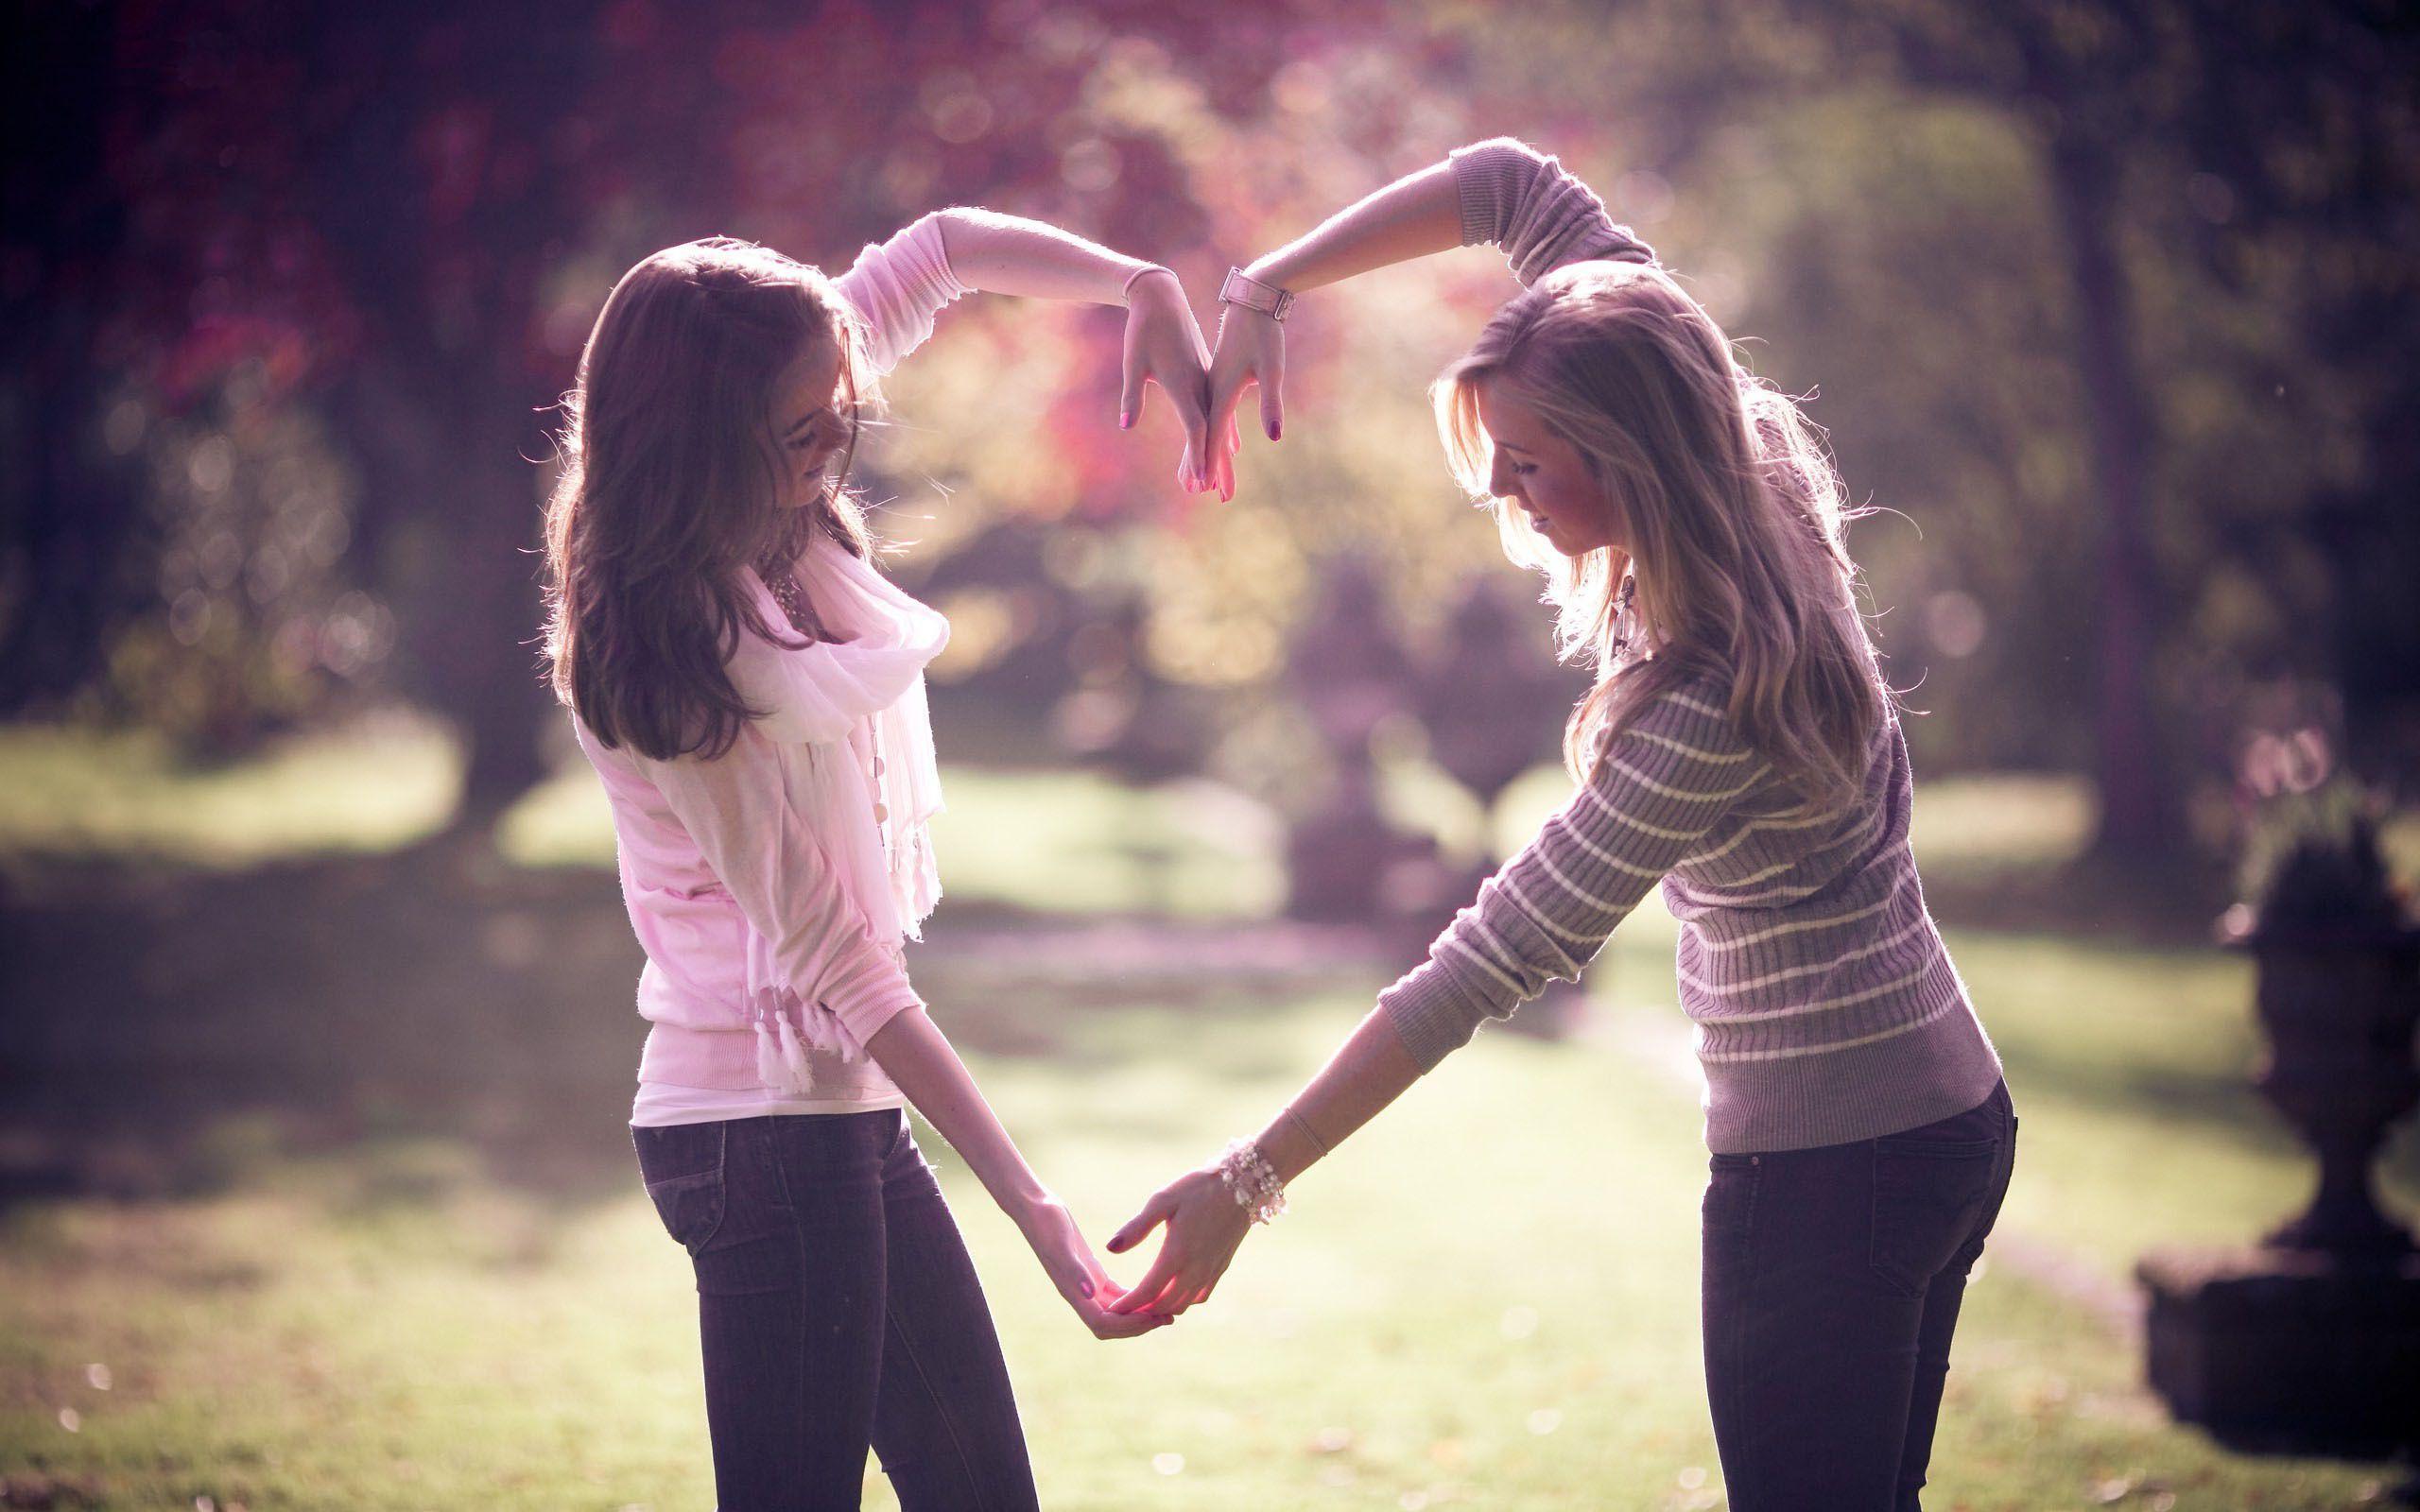 10 Best images about Best Friends on Pinterest   Friendship, Best